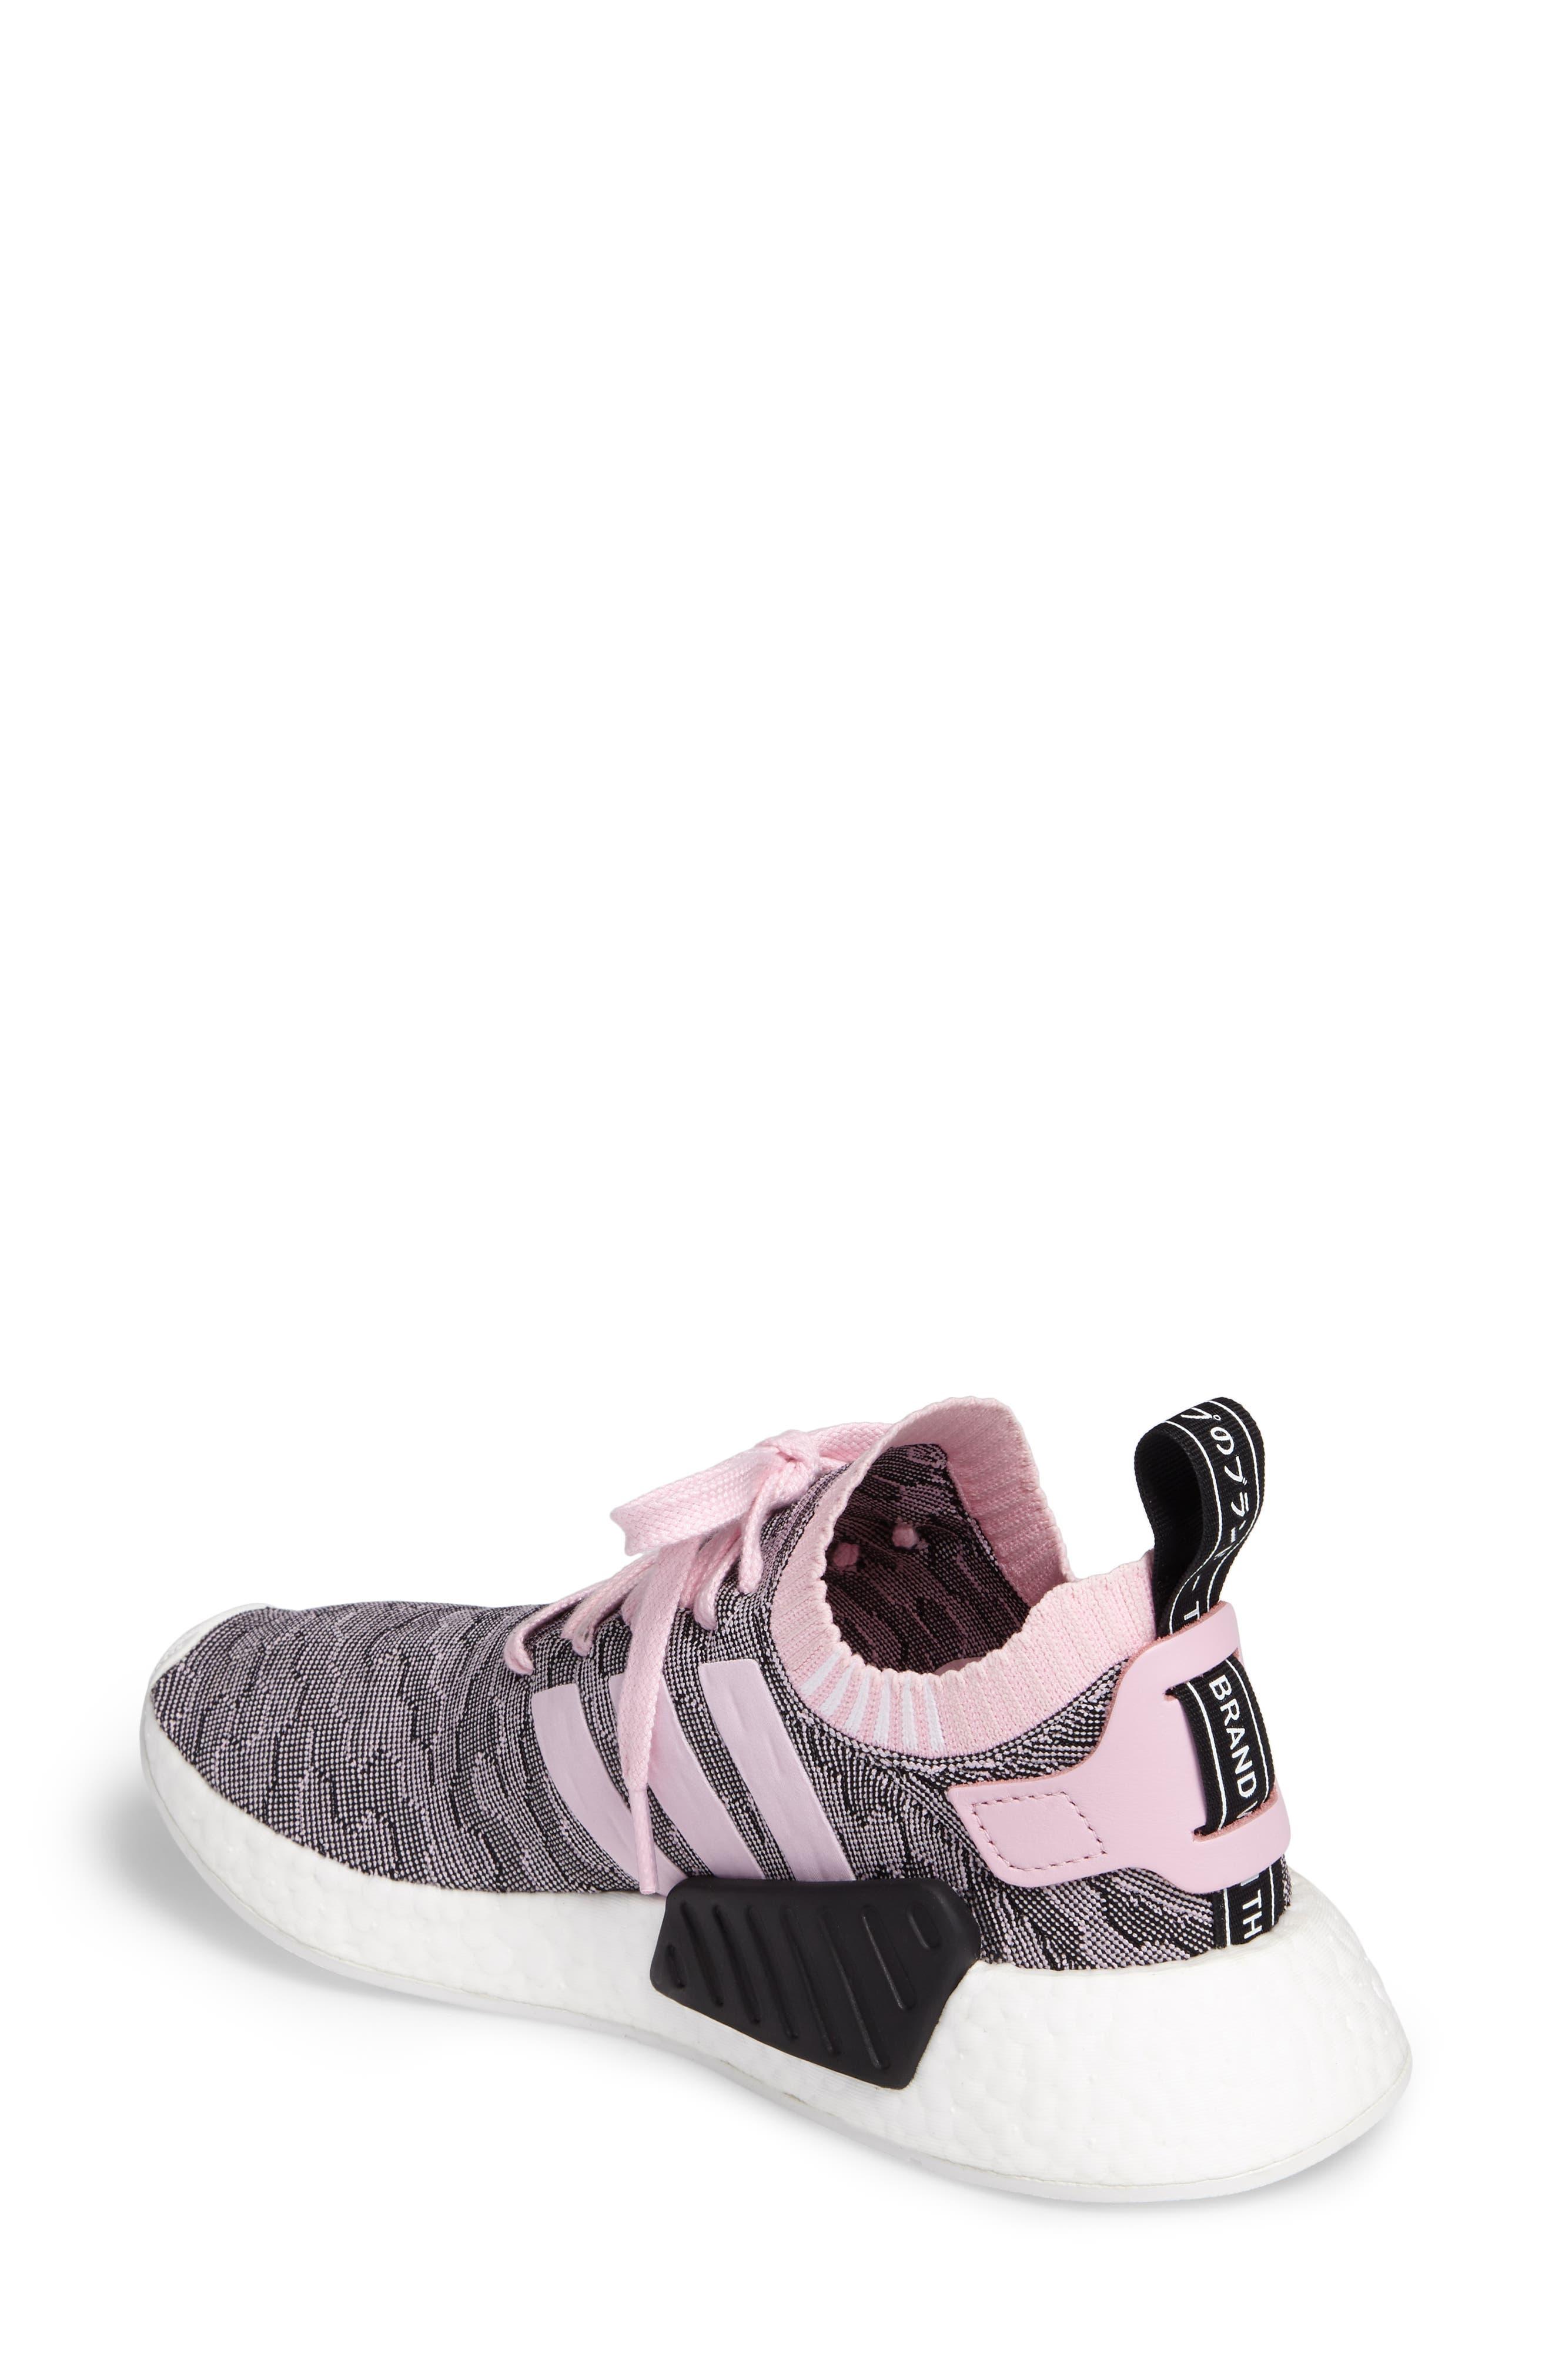 NMD R2 Primeknit Athletic Shoe,                             Alternate thumbnail 10, color,